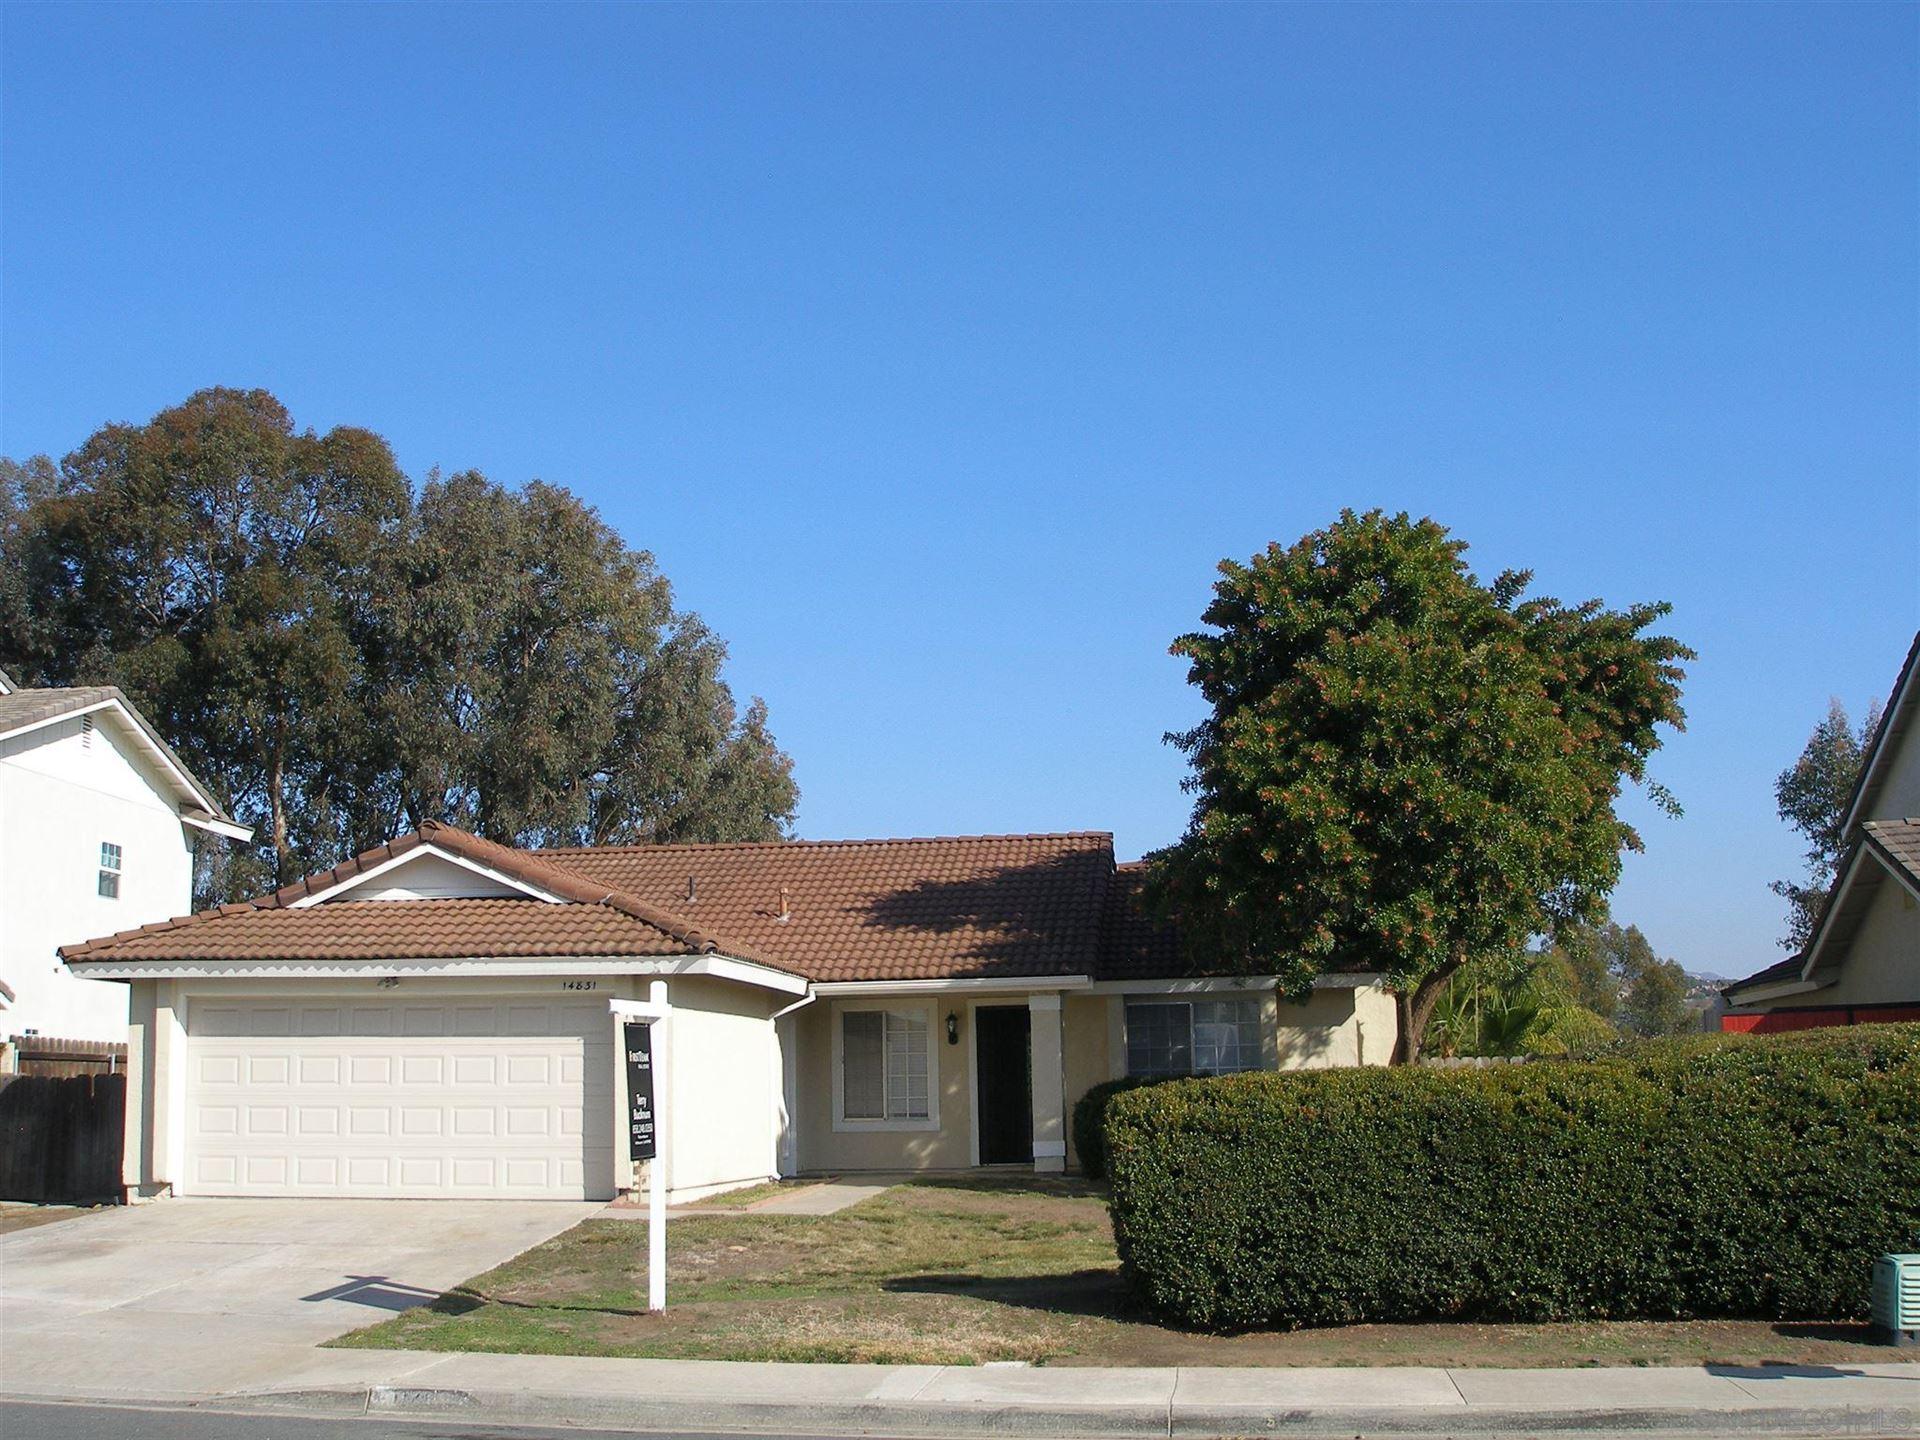 Photo of 14831 Morningside Dr., Poway, CA 92064 (MLS # 210000438)